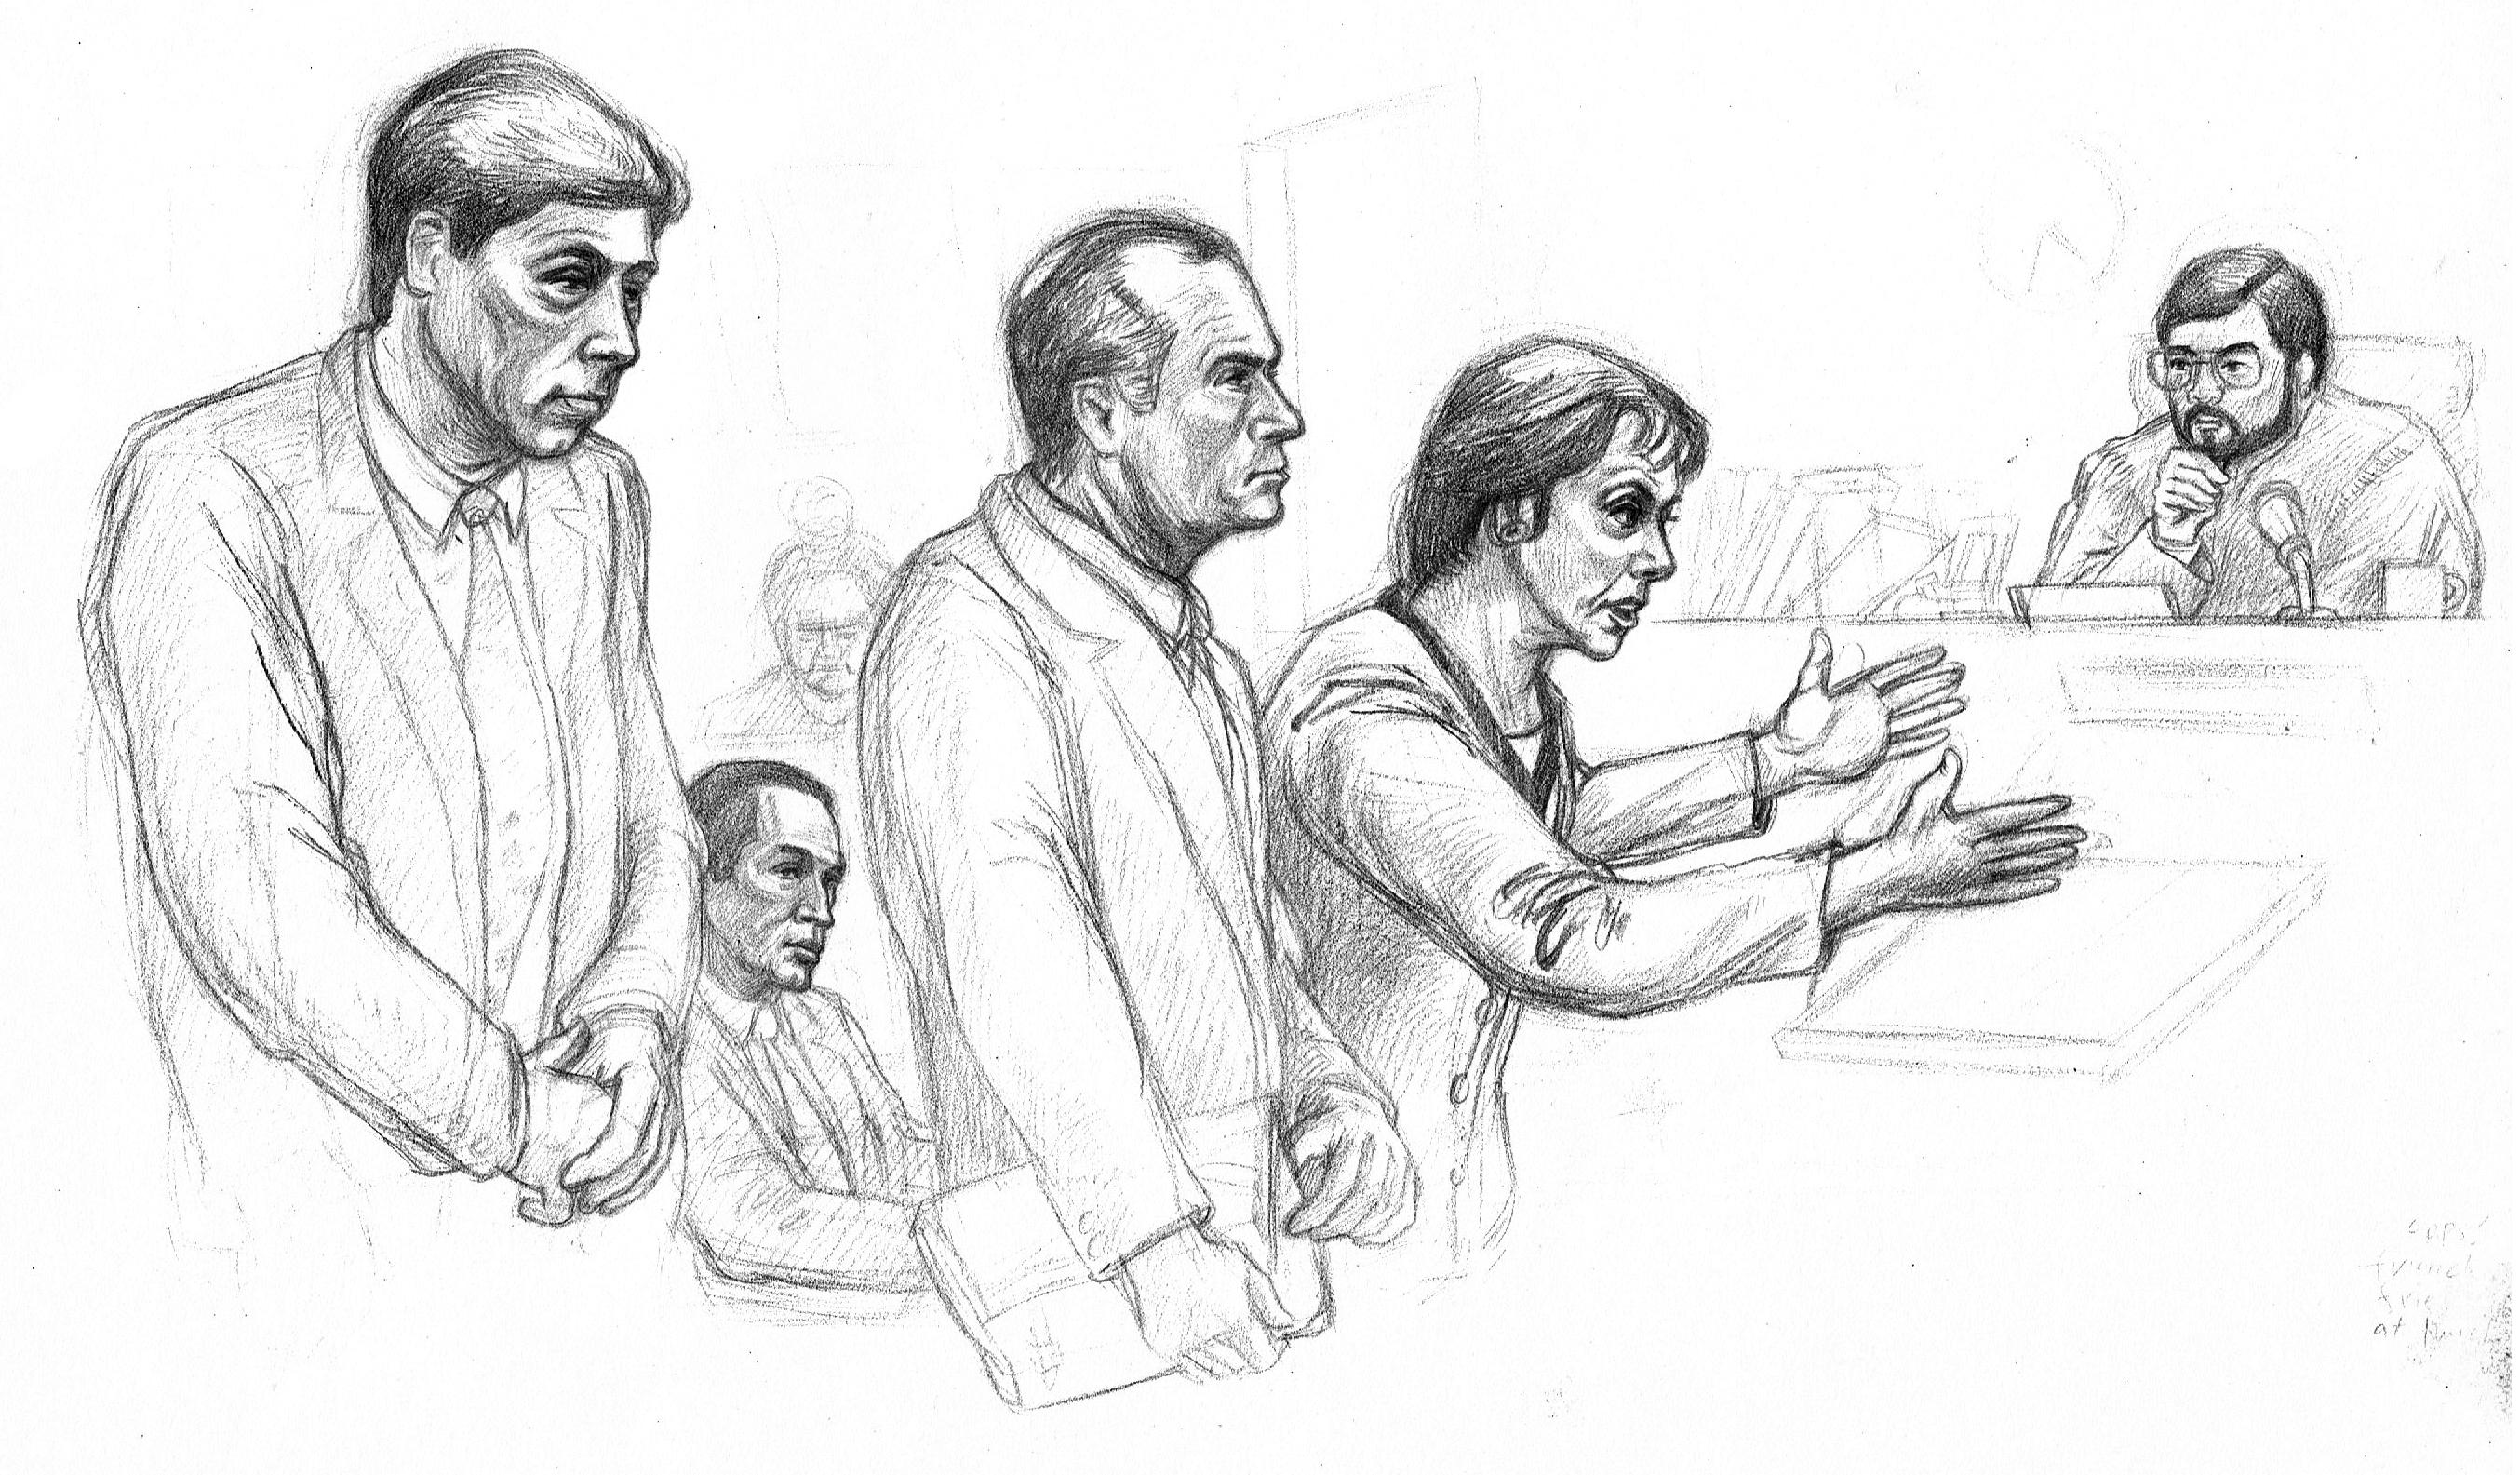 Fuhrman, Lawyer & Marcia Court